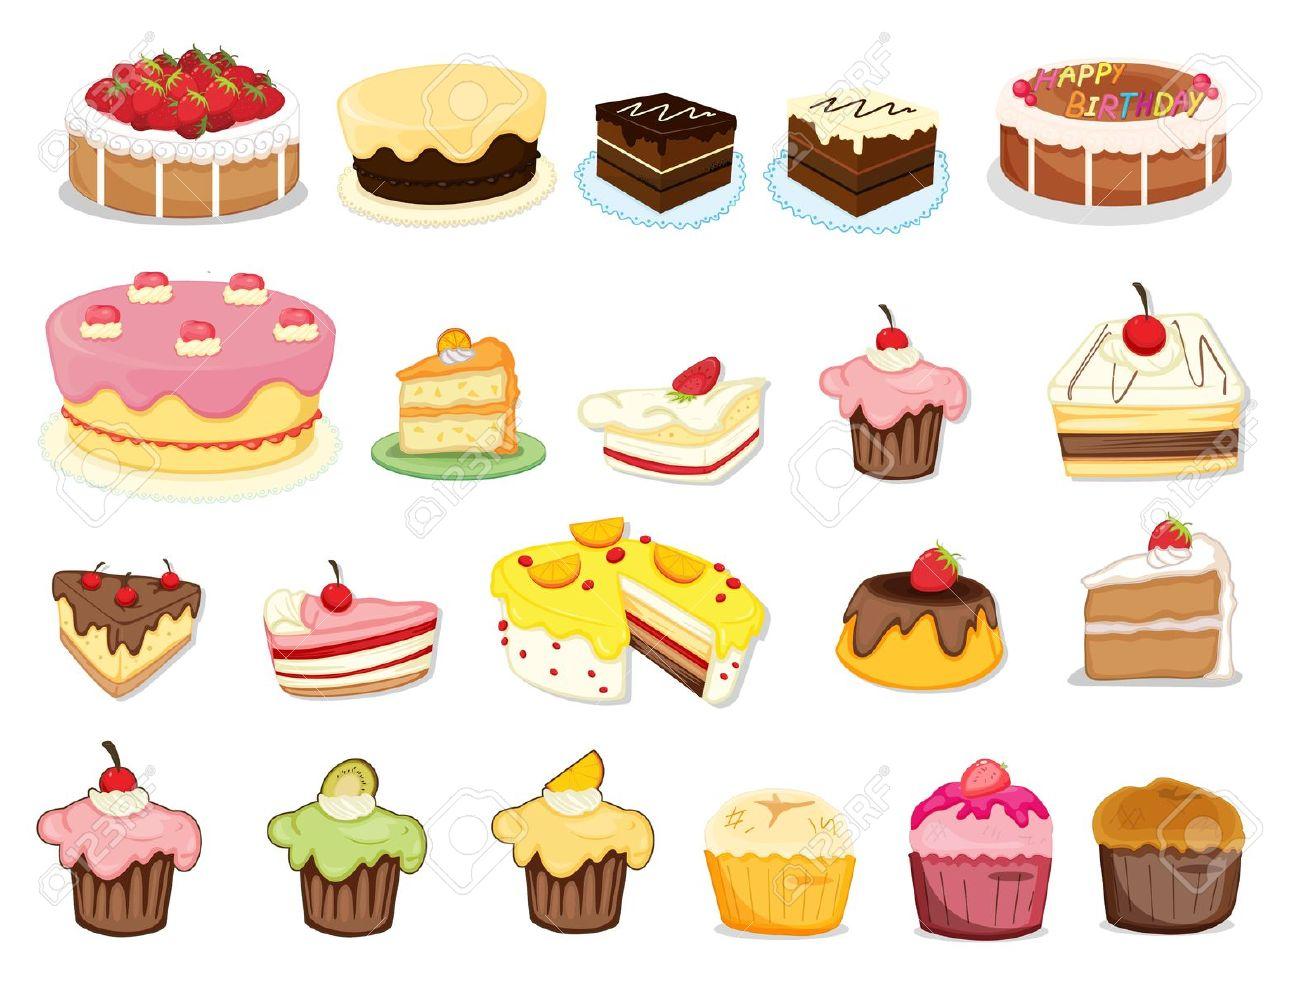 Desserts clipart clip art. Free holiday dessert cliparts